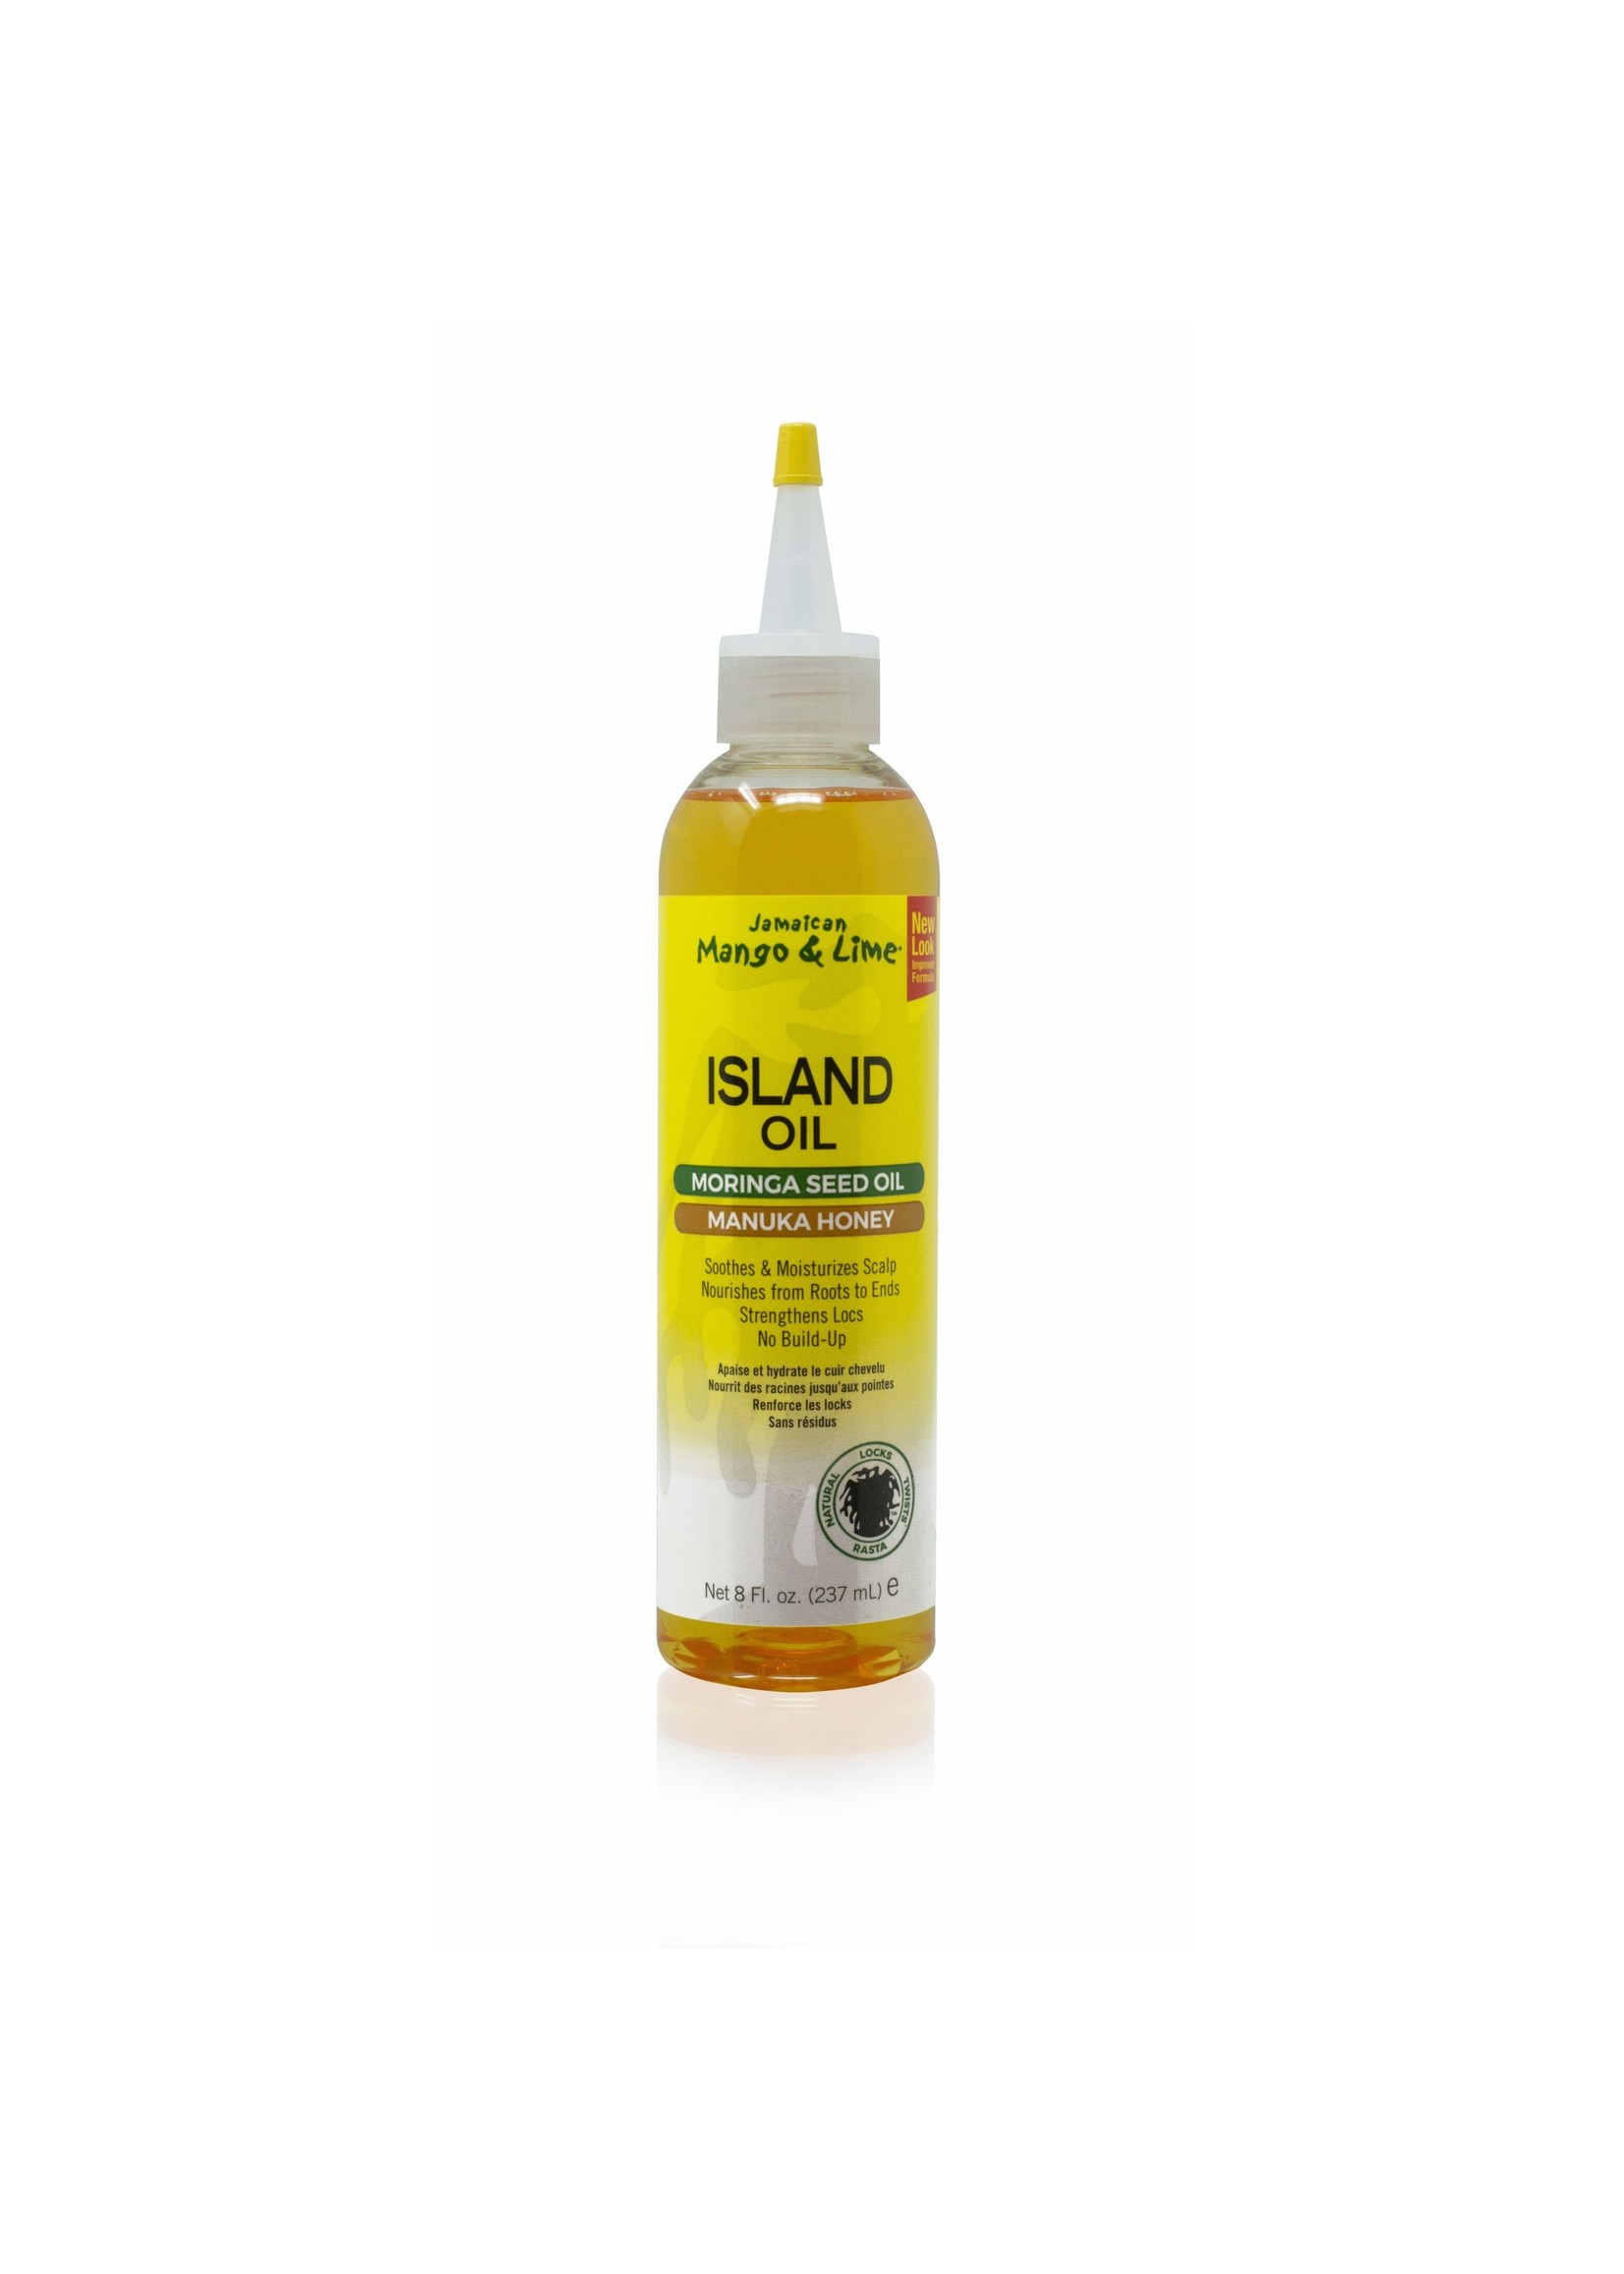 Jamaican Mango Lime Island Oil